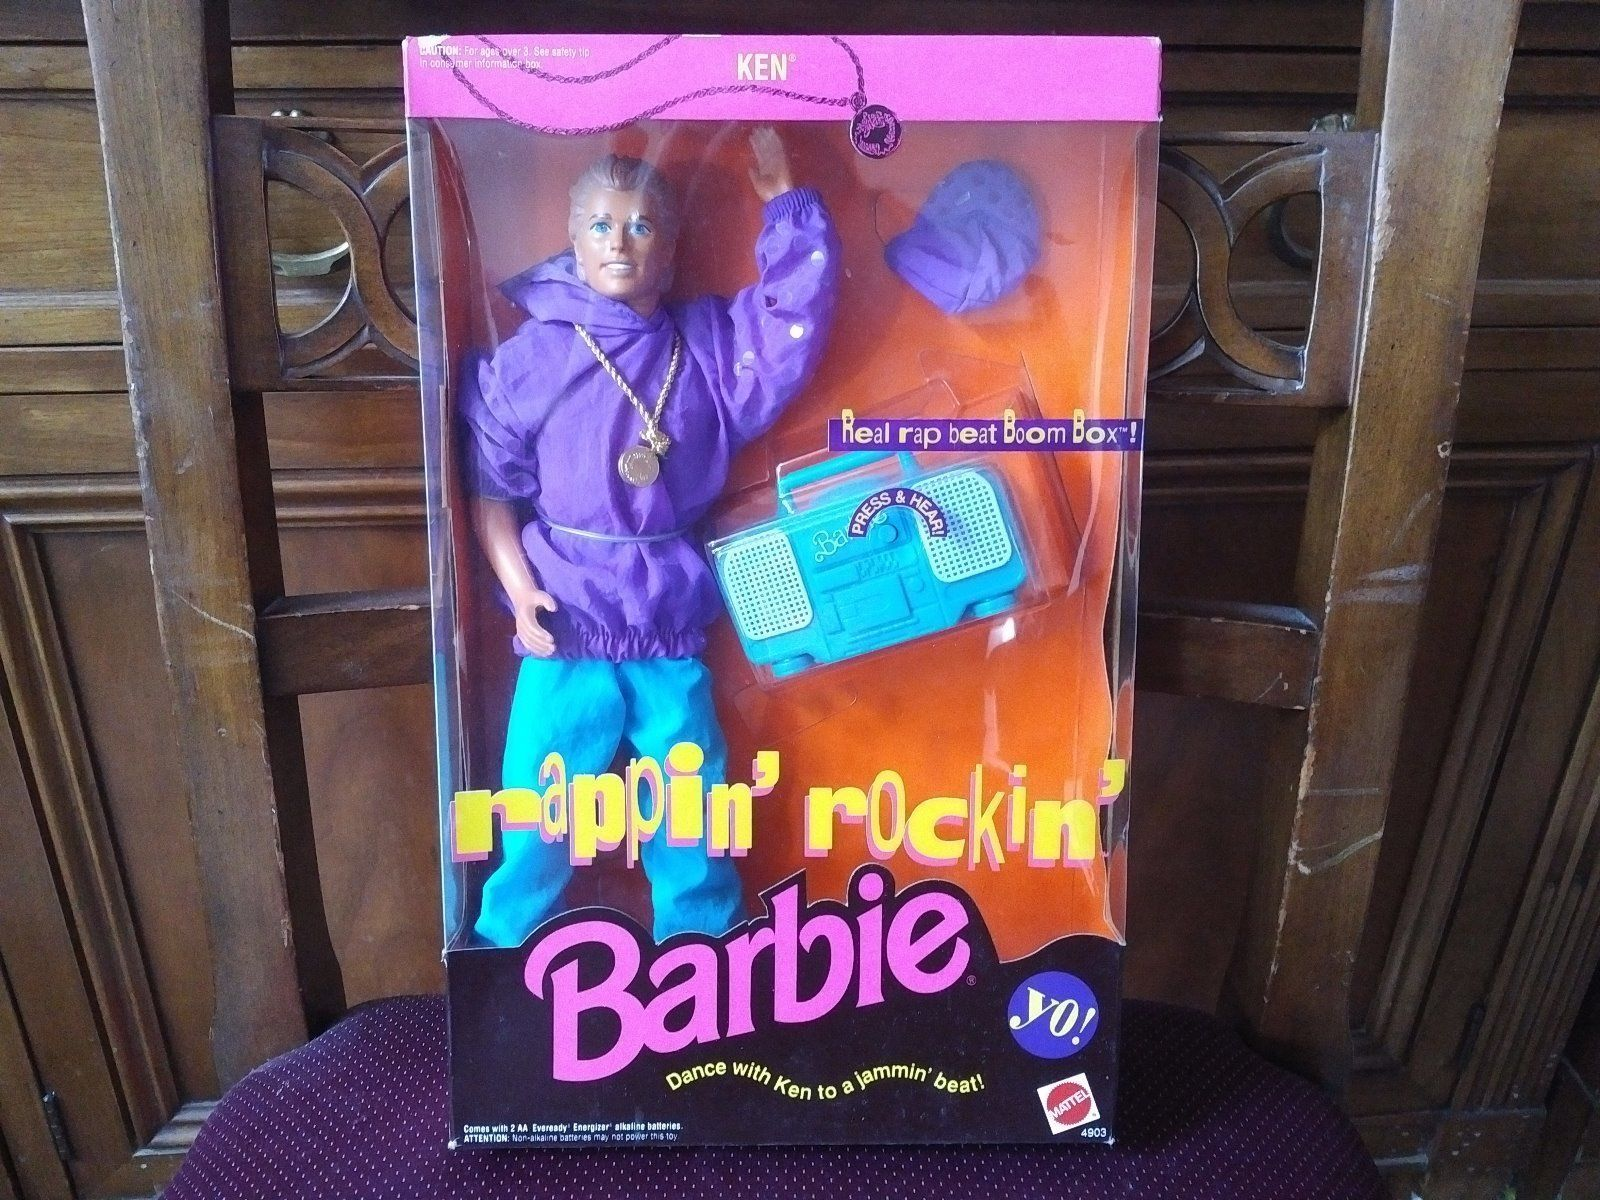 Rappin' Rockin' Ken